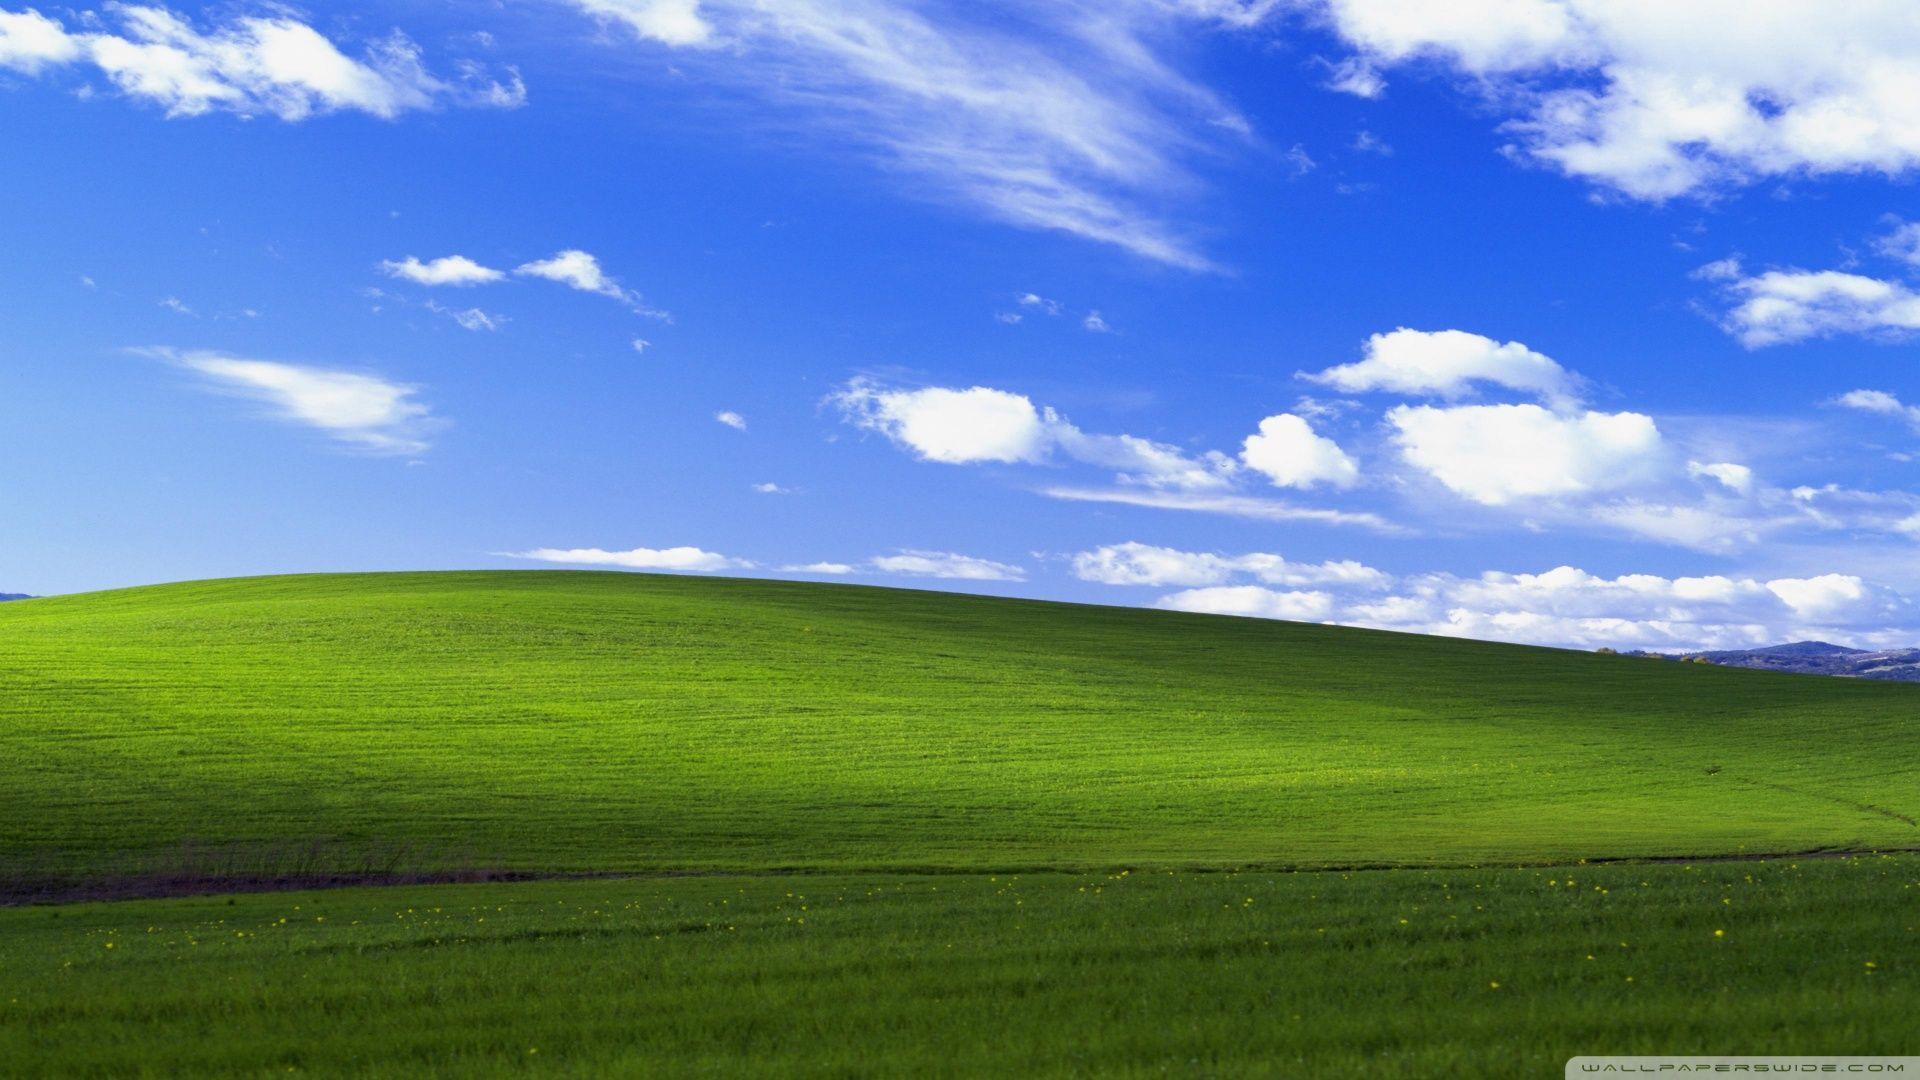 windows_xp_original-wallpaper-1920x1080.jpg